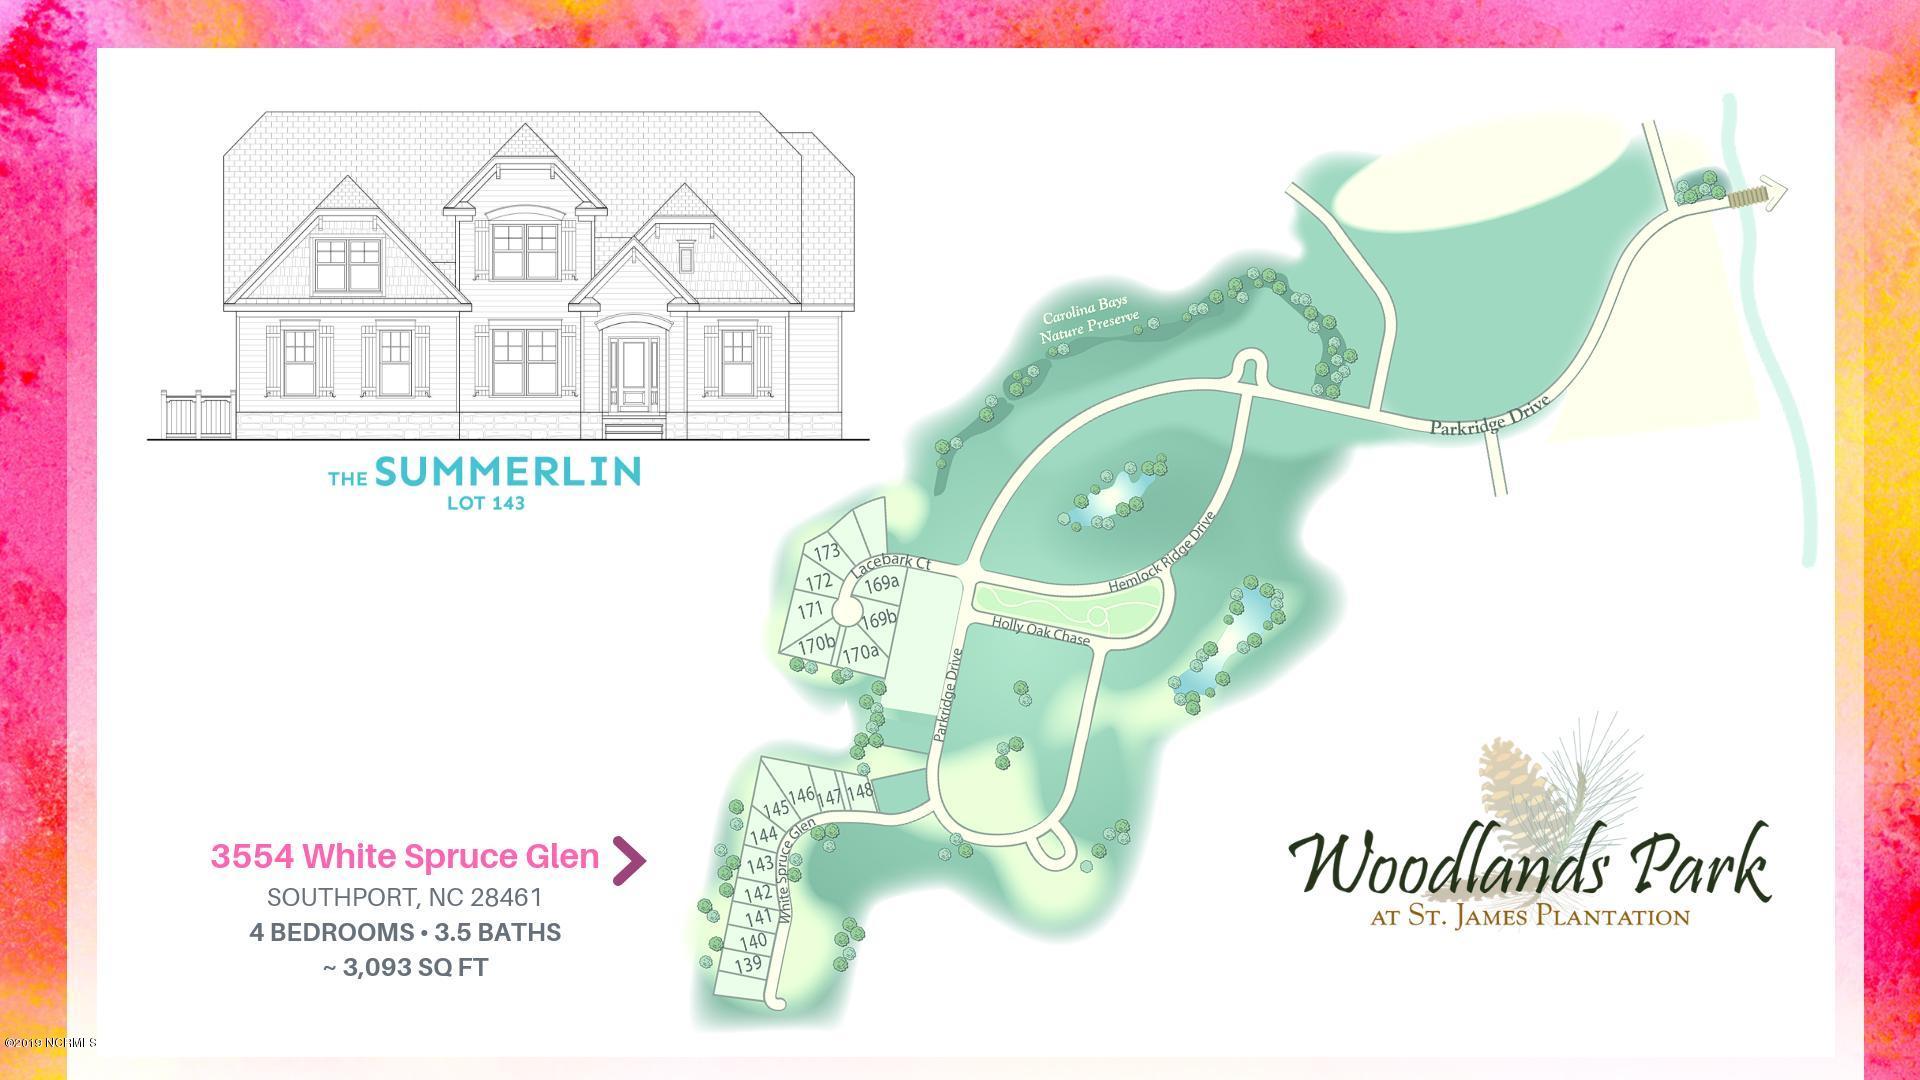 3554 White Spruce Glen Southport, NC 28461